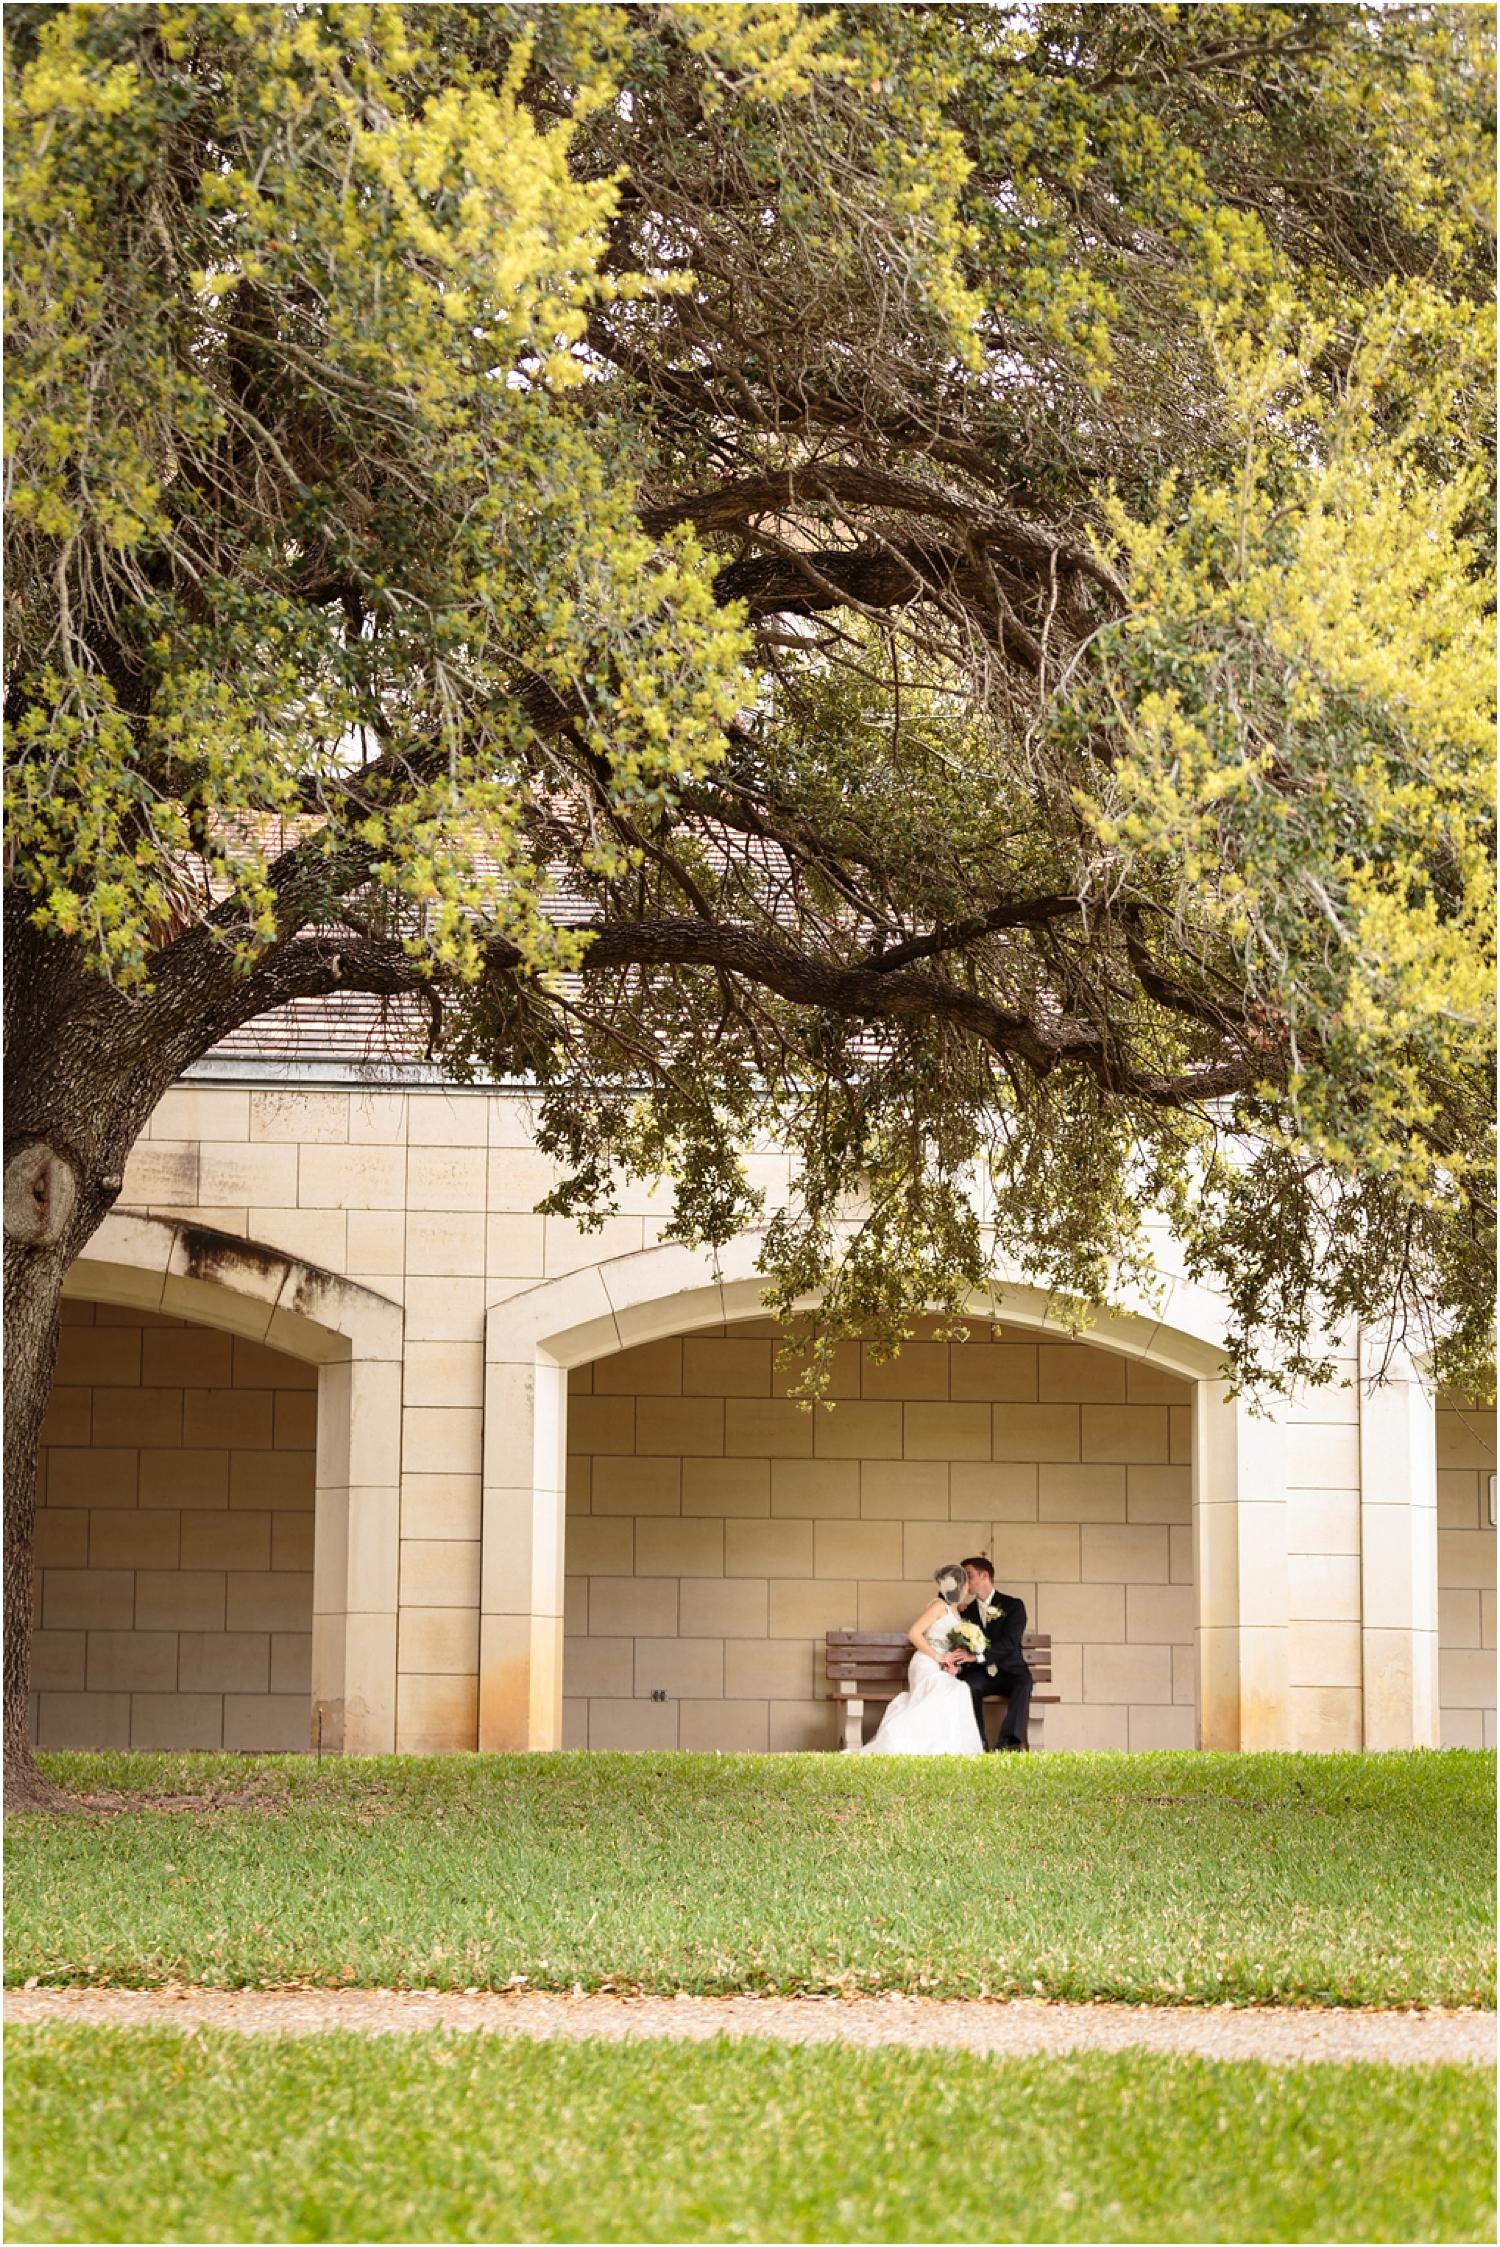 20150314-texas-outdoor-wedding-33_blog.jpg